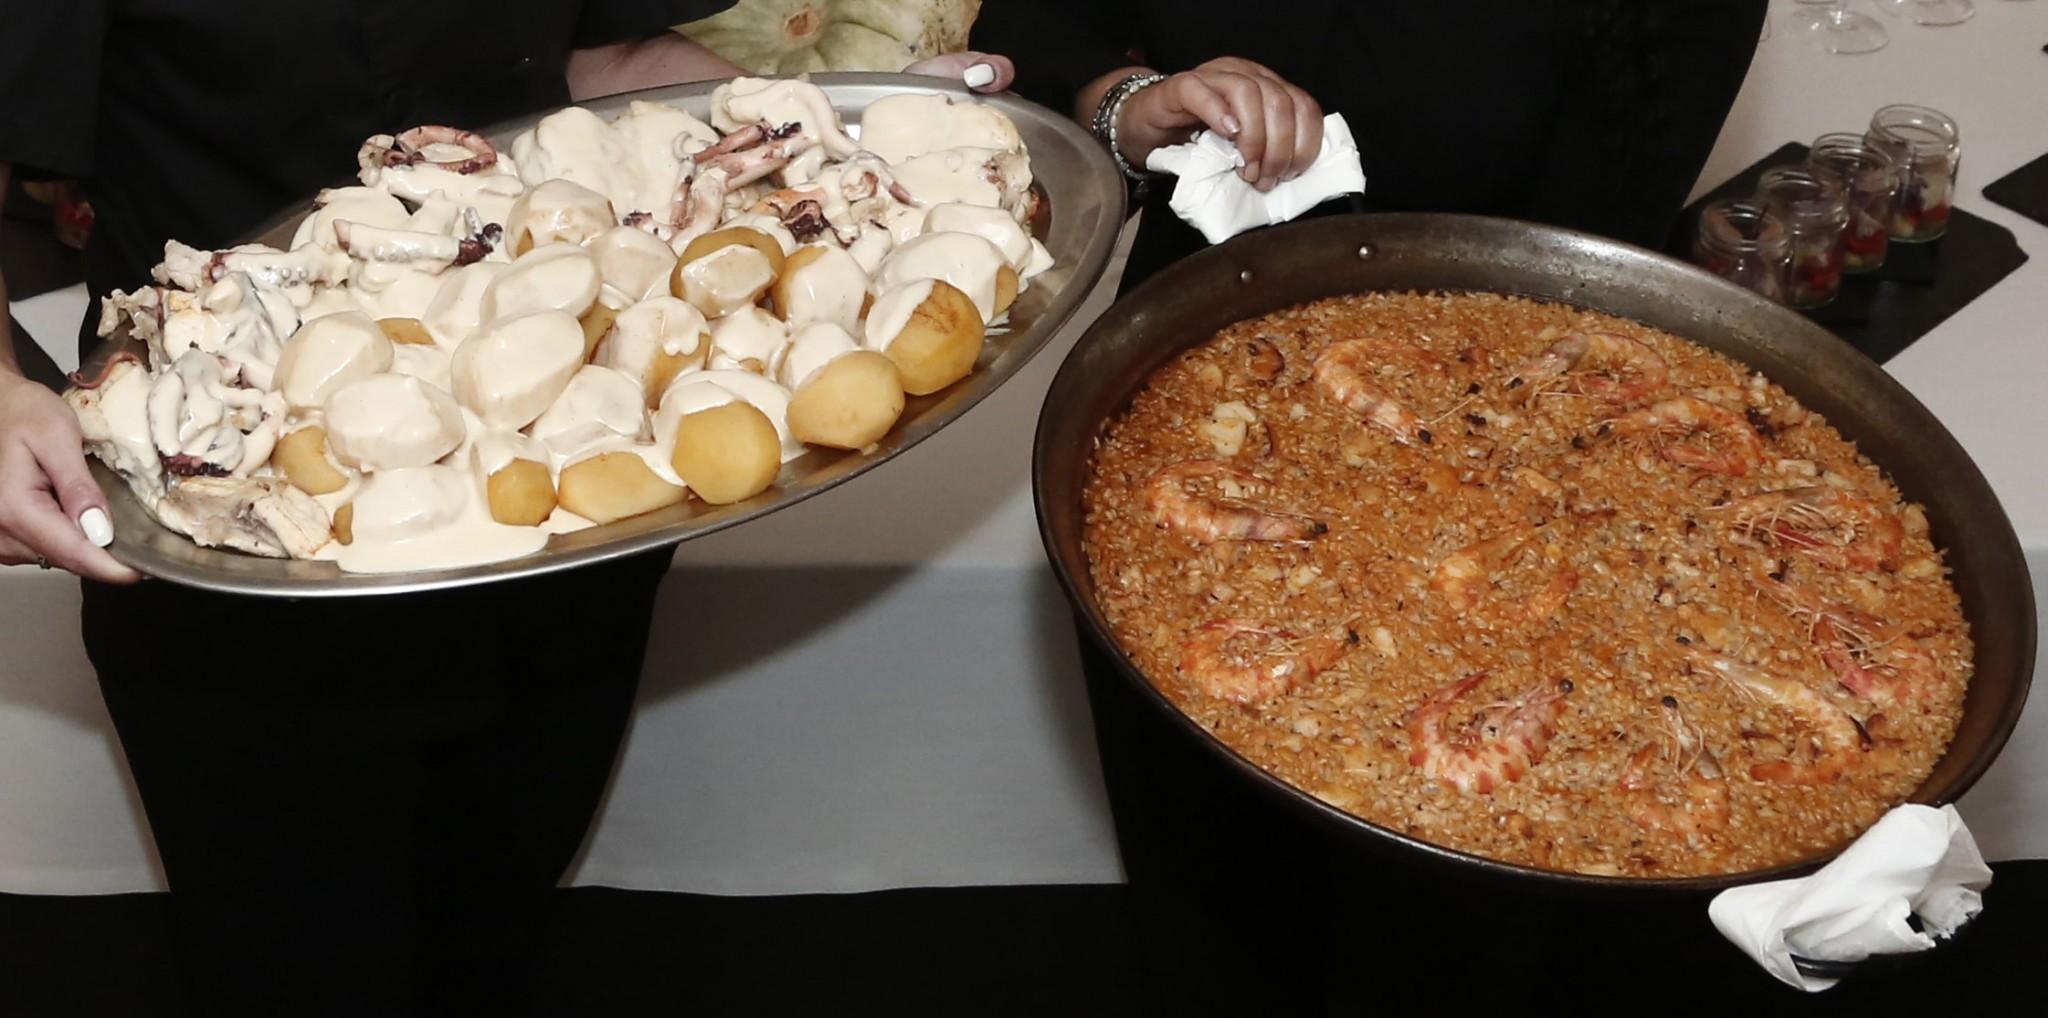 Jornadas gastronomicas Arroz a Banda - Castellón Turismo